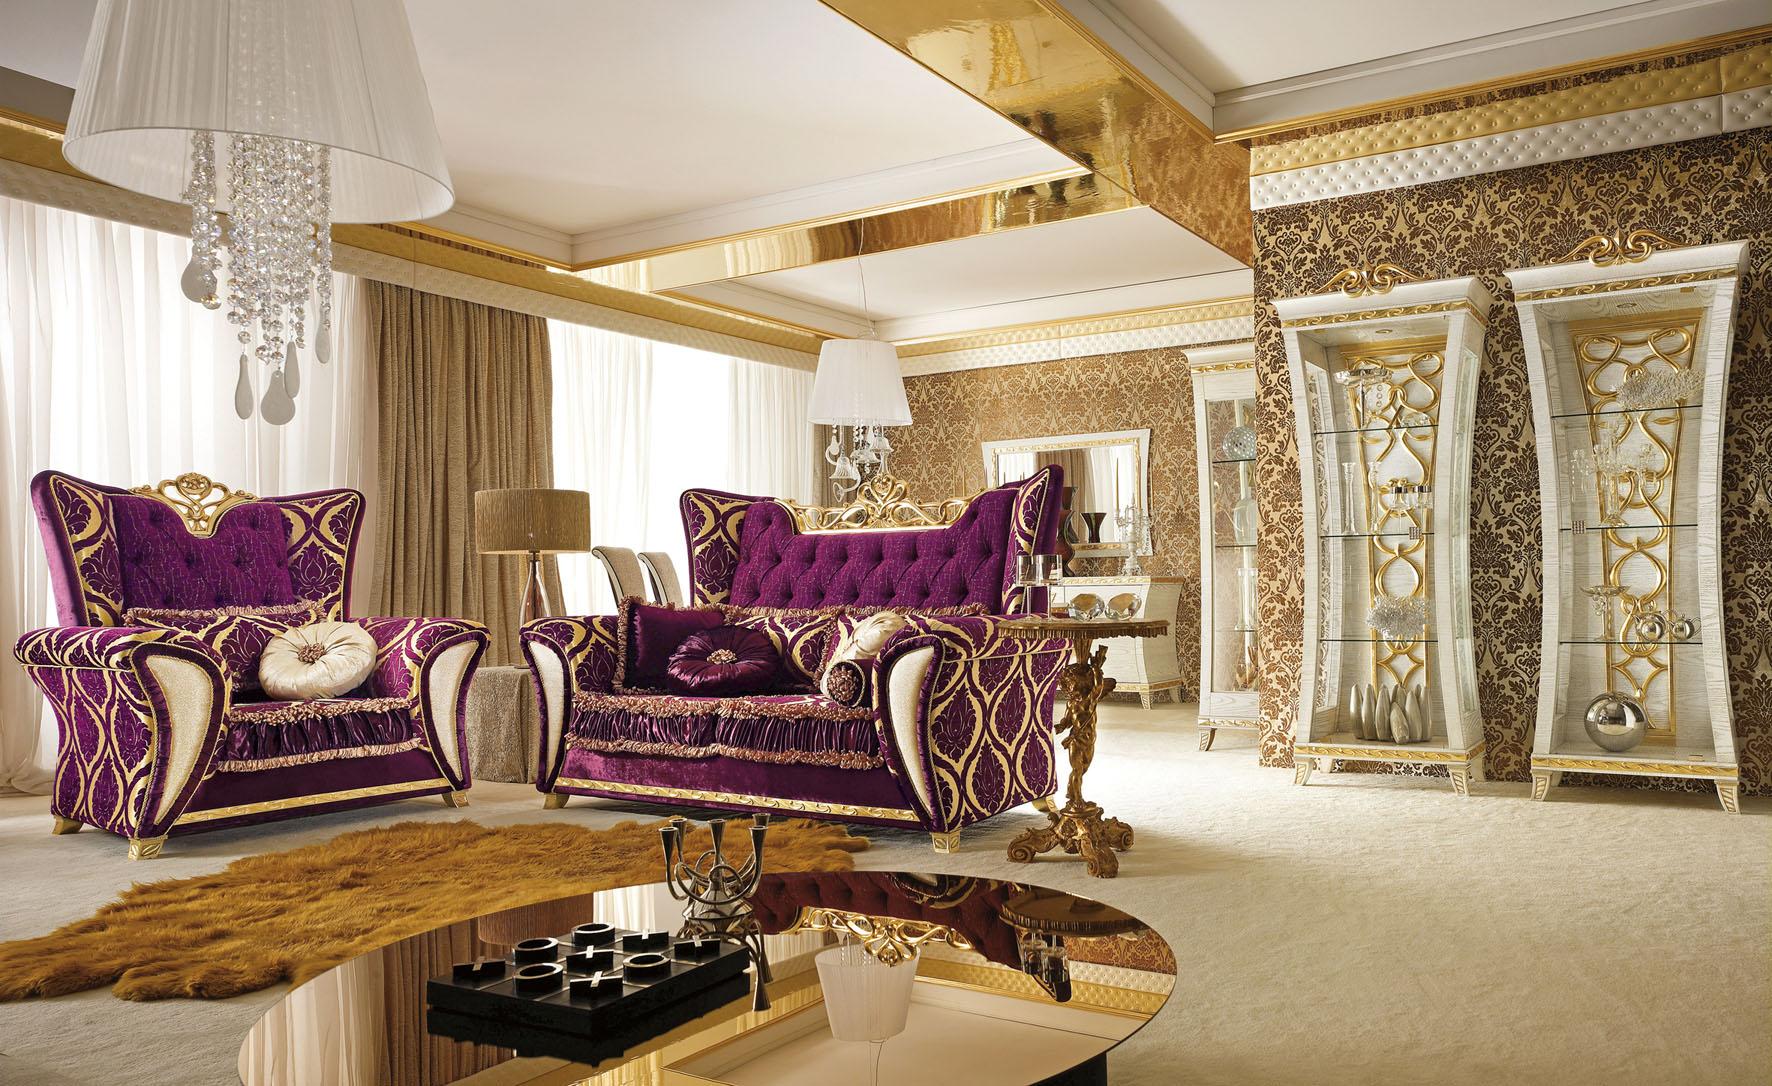 Armonia ed eleganza con gotha italian luxury style for Luxury style